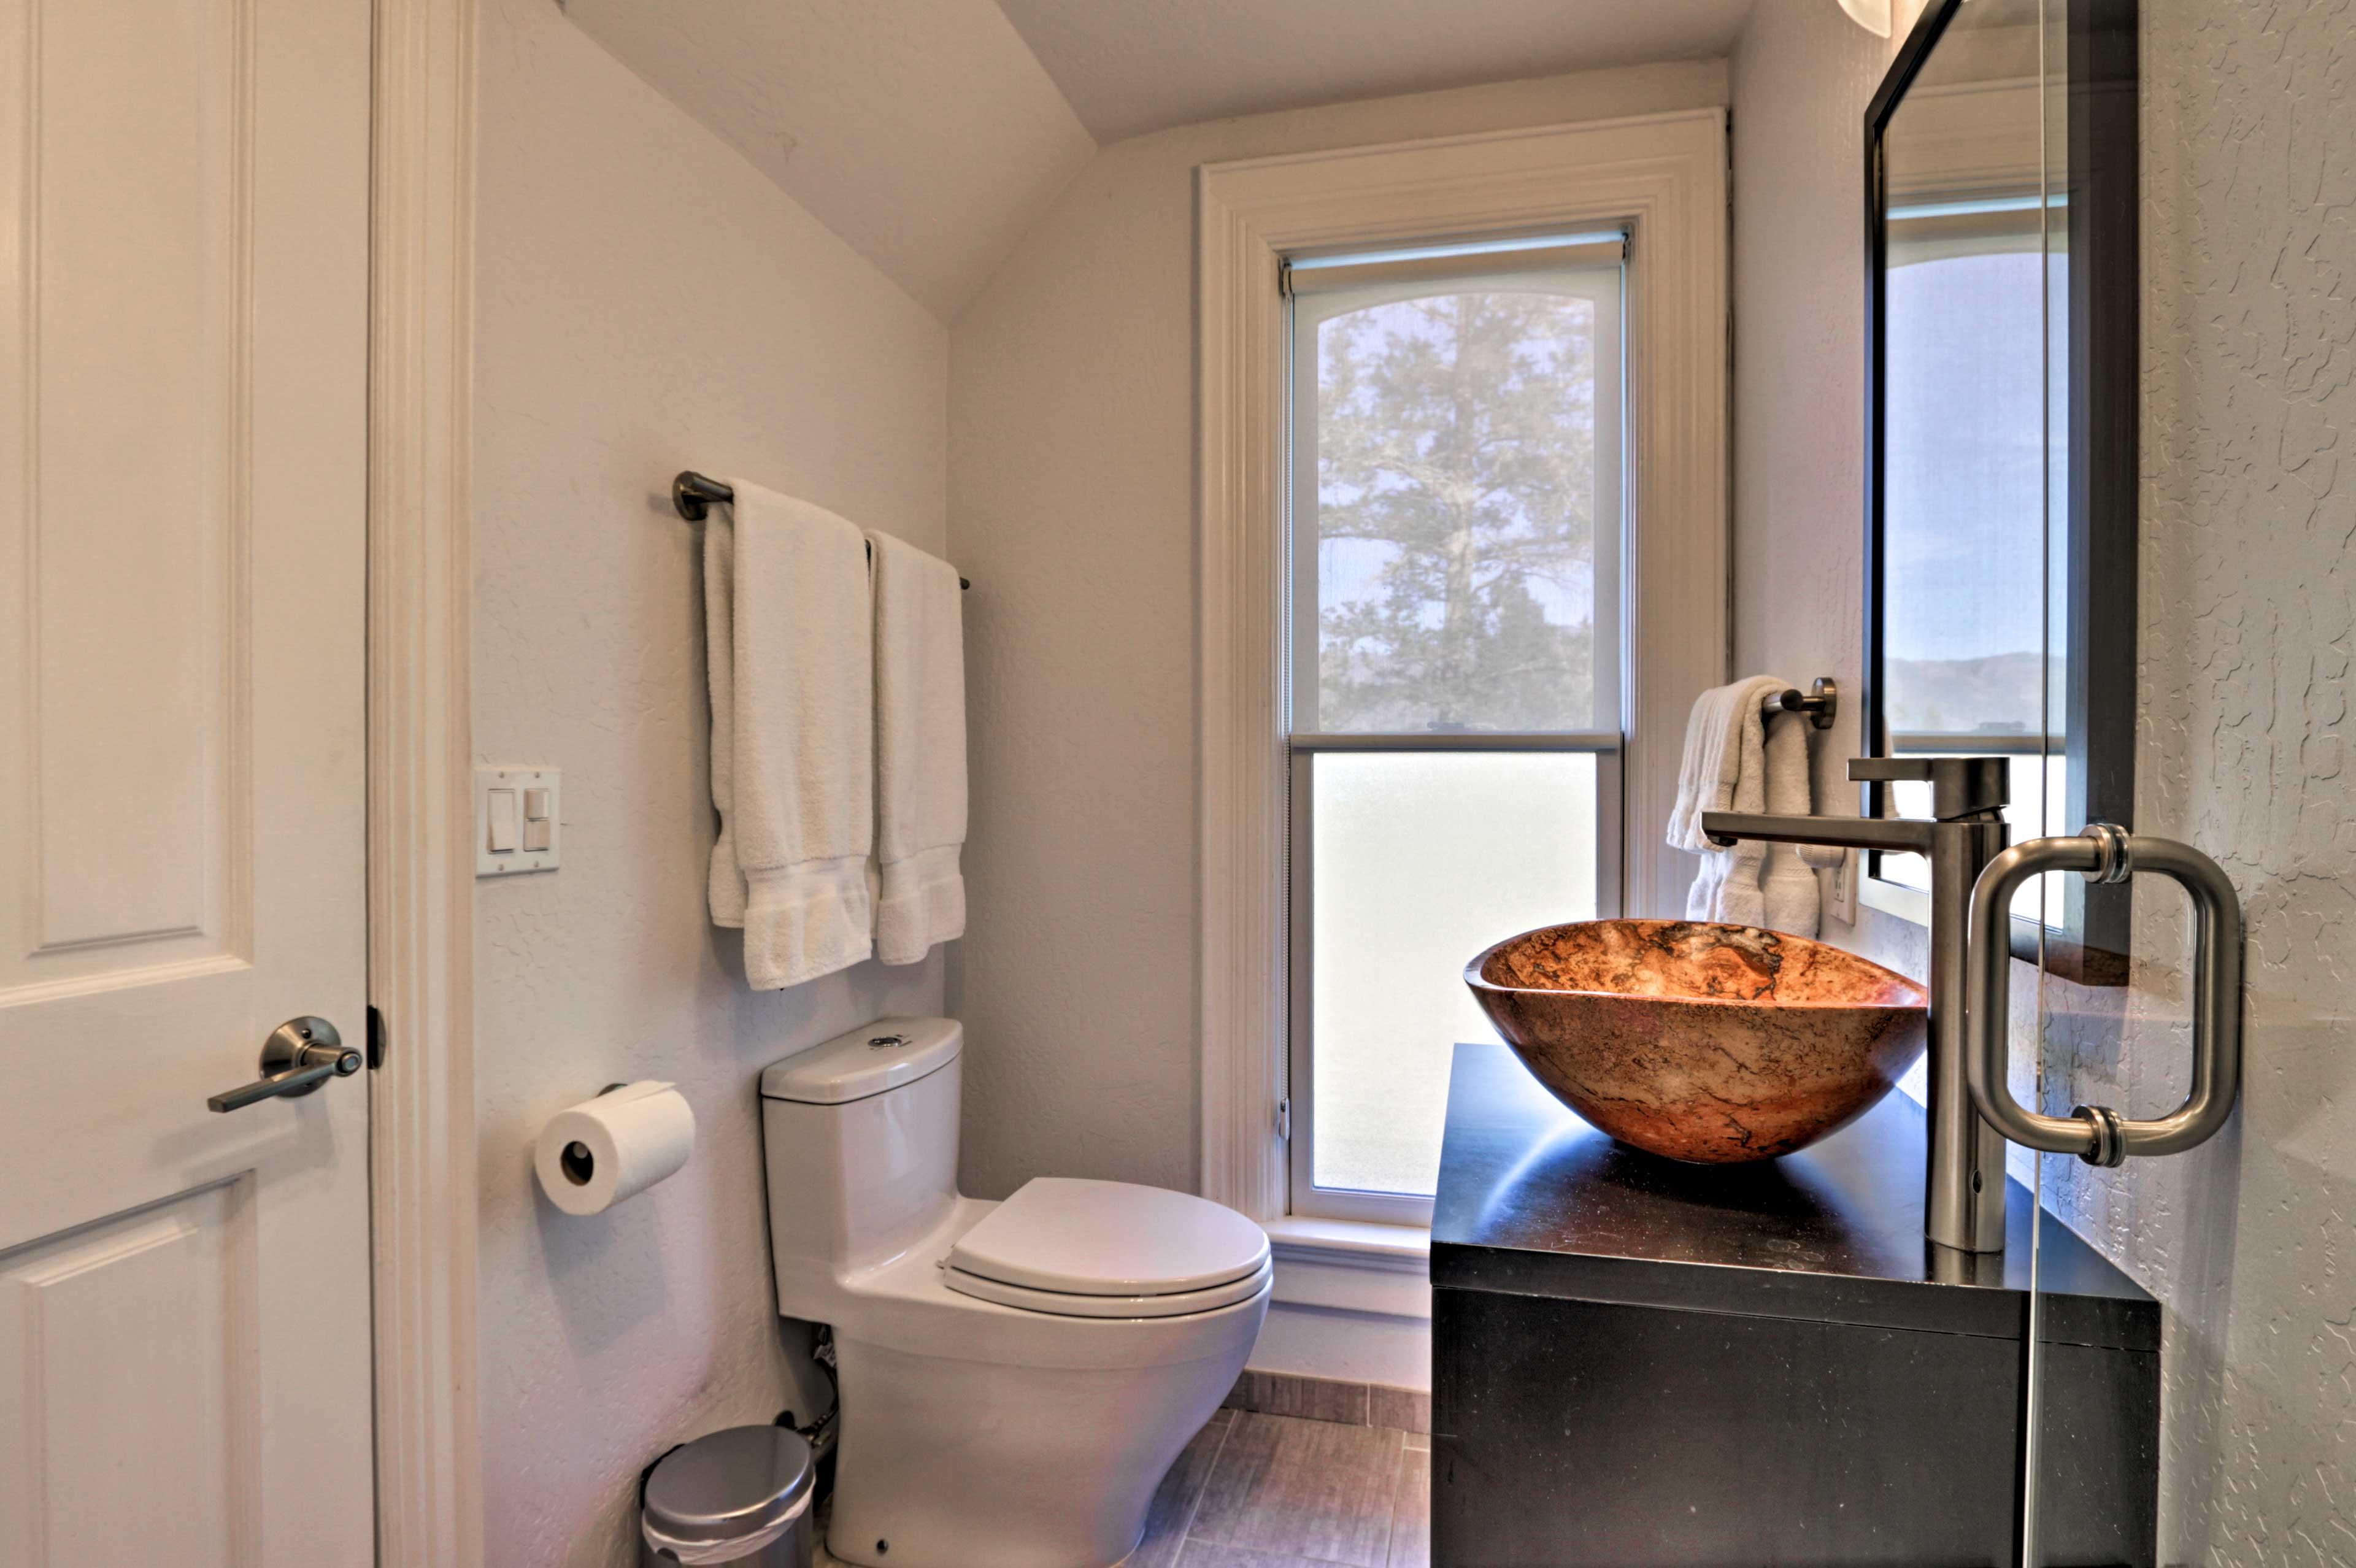 Several bathrooms provide plenty of privacy.